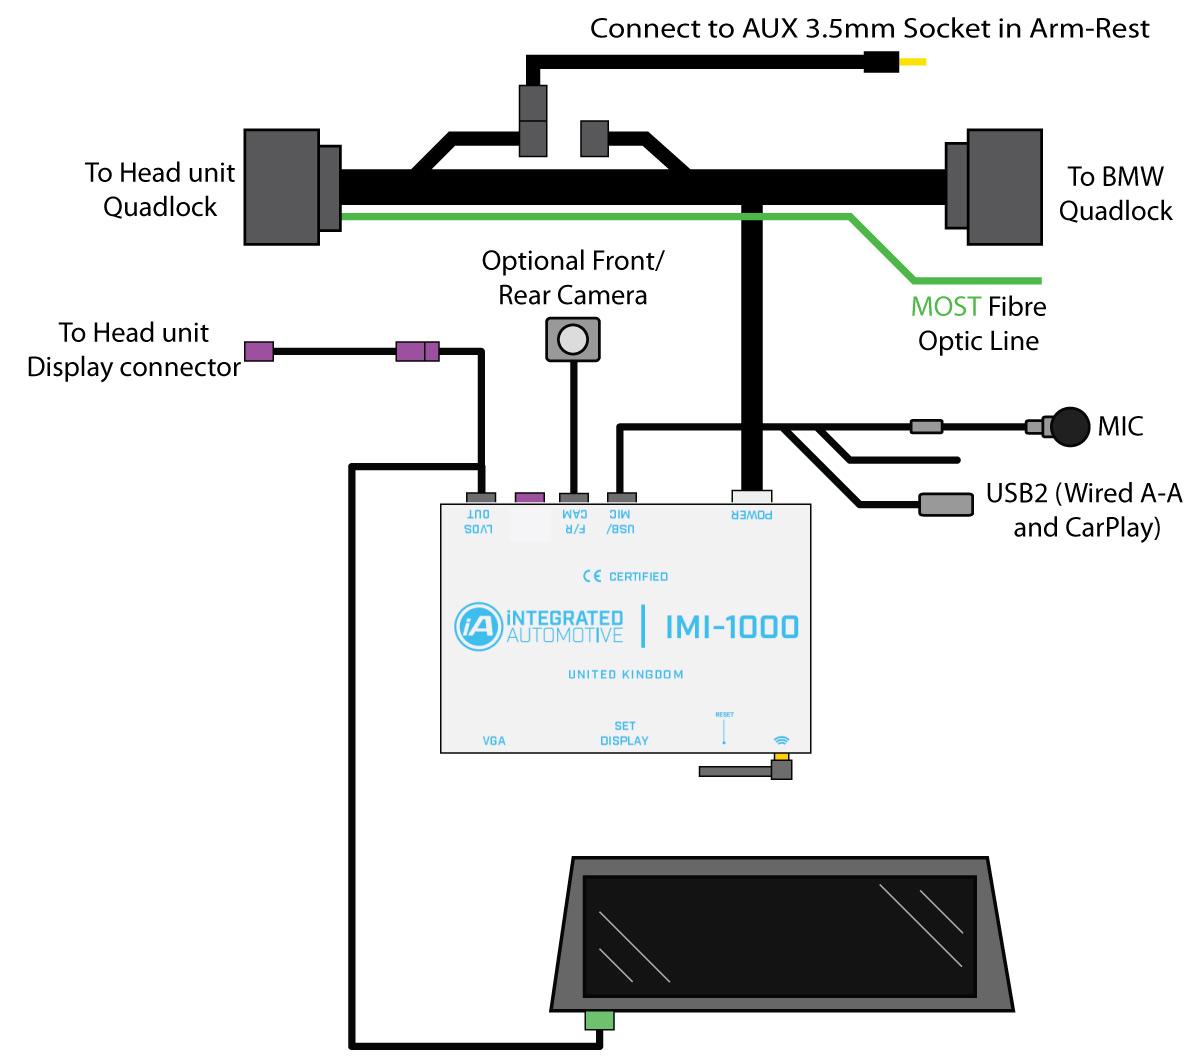 BMW CiC retrofit CarPlay connection diagram